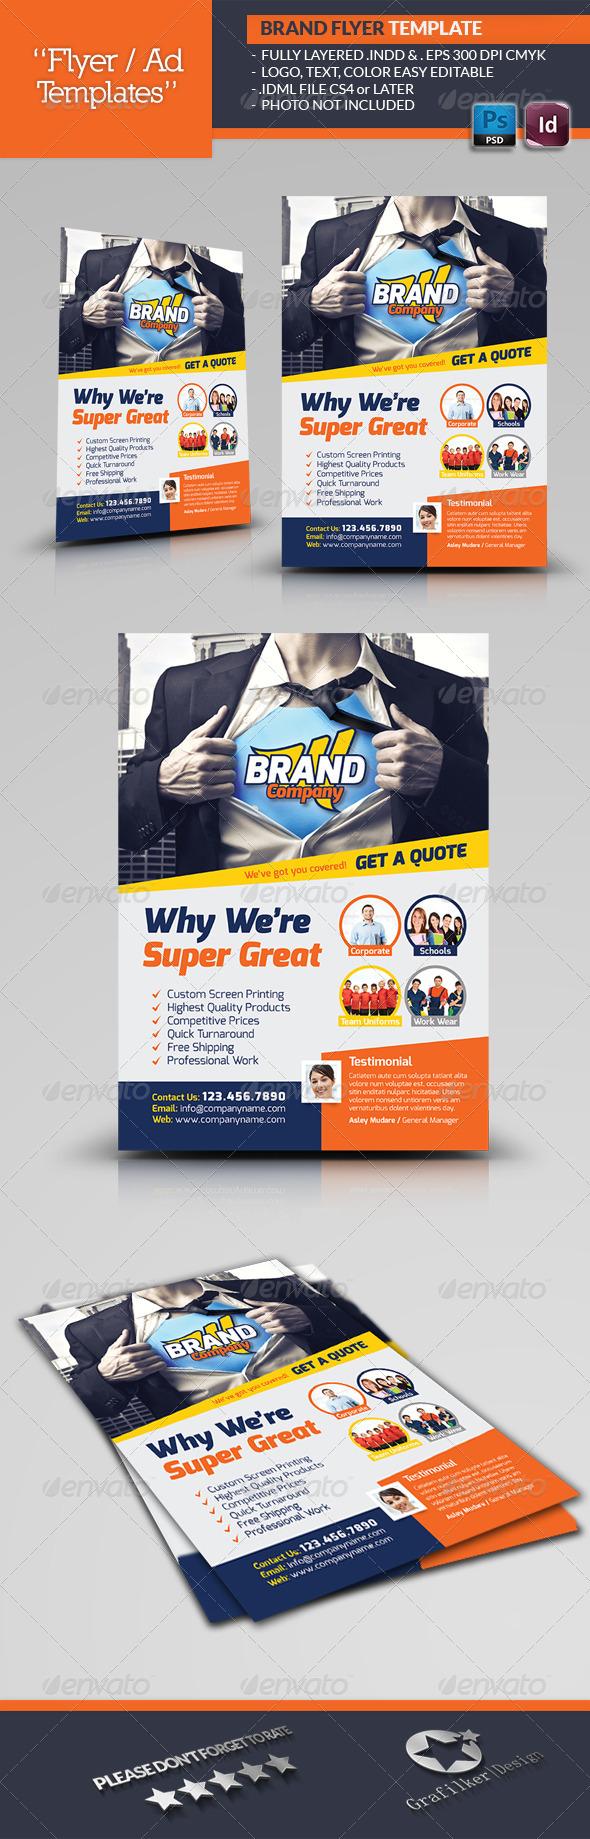 Creative Brand Flyer Template - Corporate Flyers